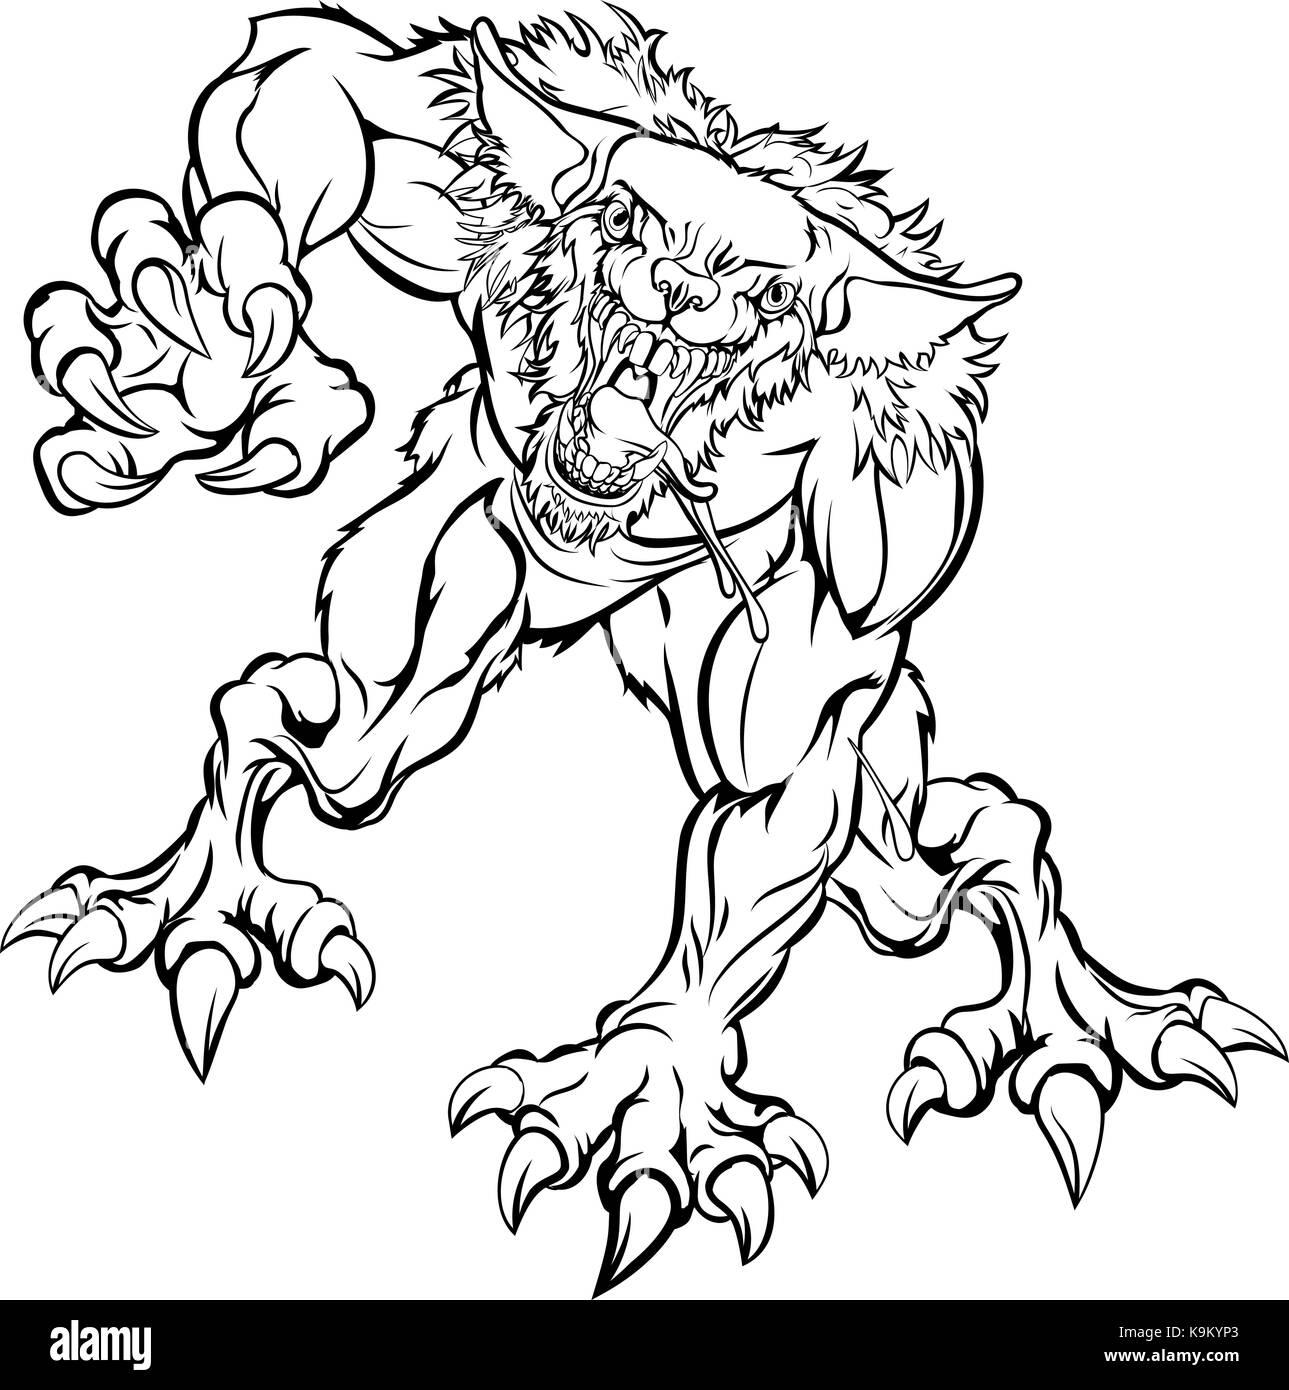 Caractere Effrayant Loup Garou Monster Image Vectorielle Stock Alamy